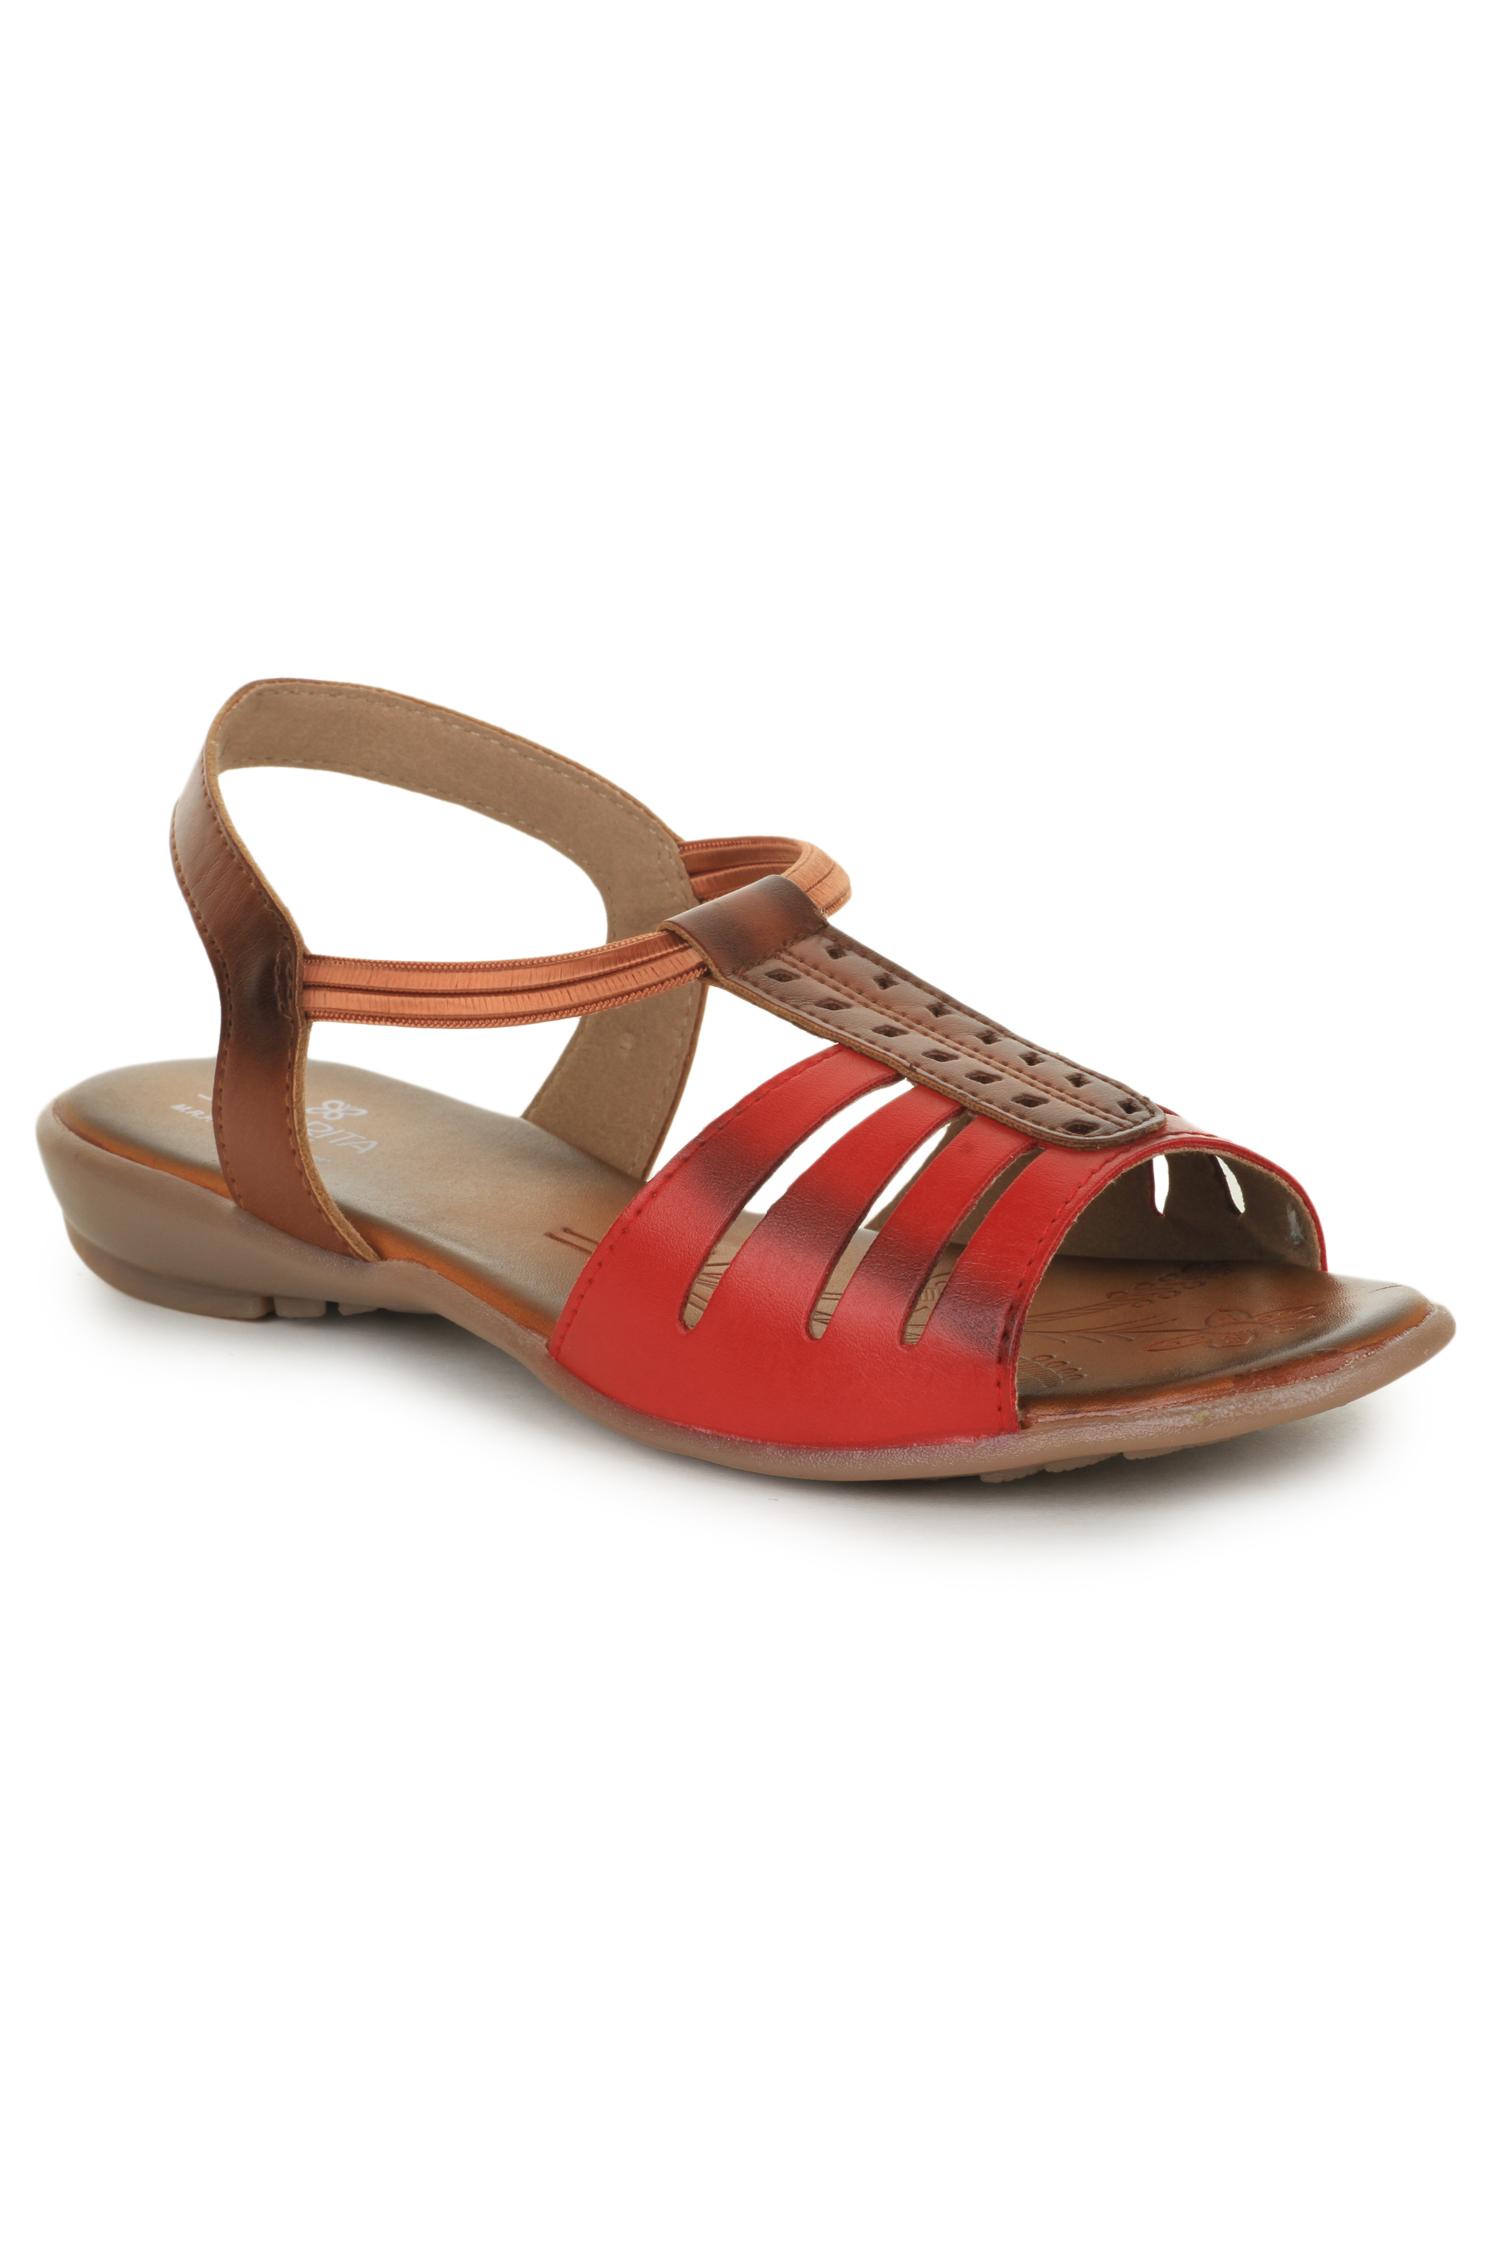 Liberty | Liberty Senorita Red Casual Sandals CH-06_Red For - Women